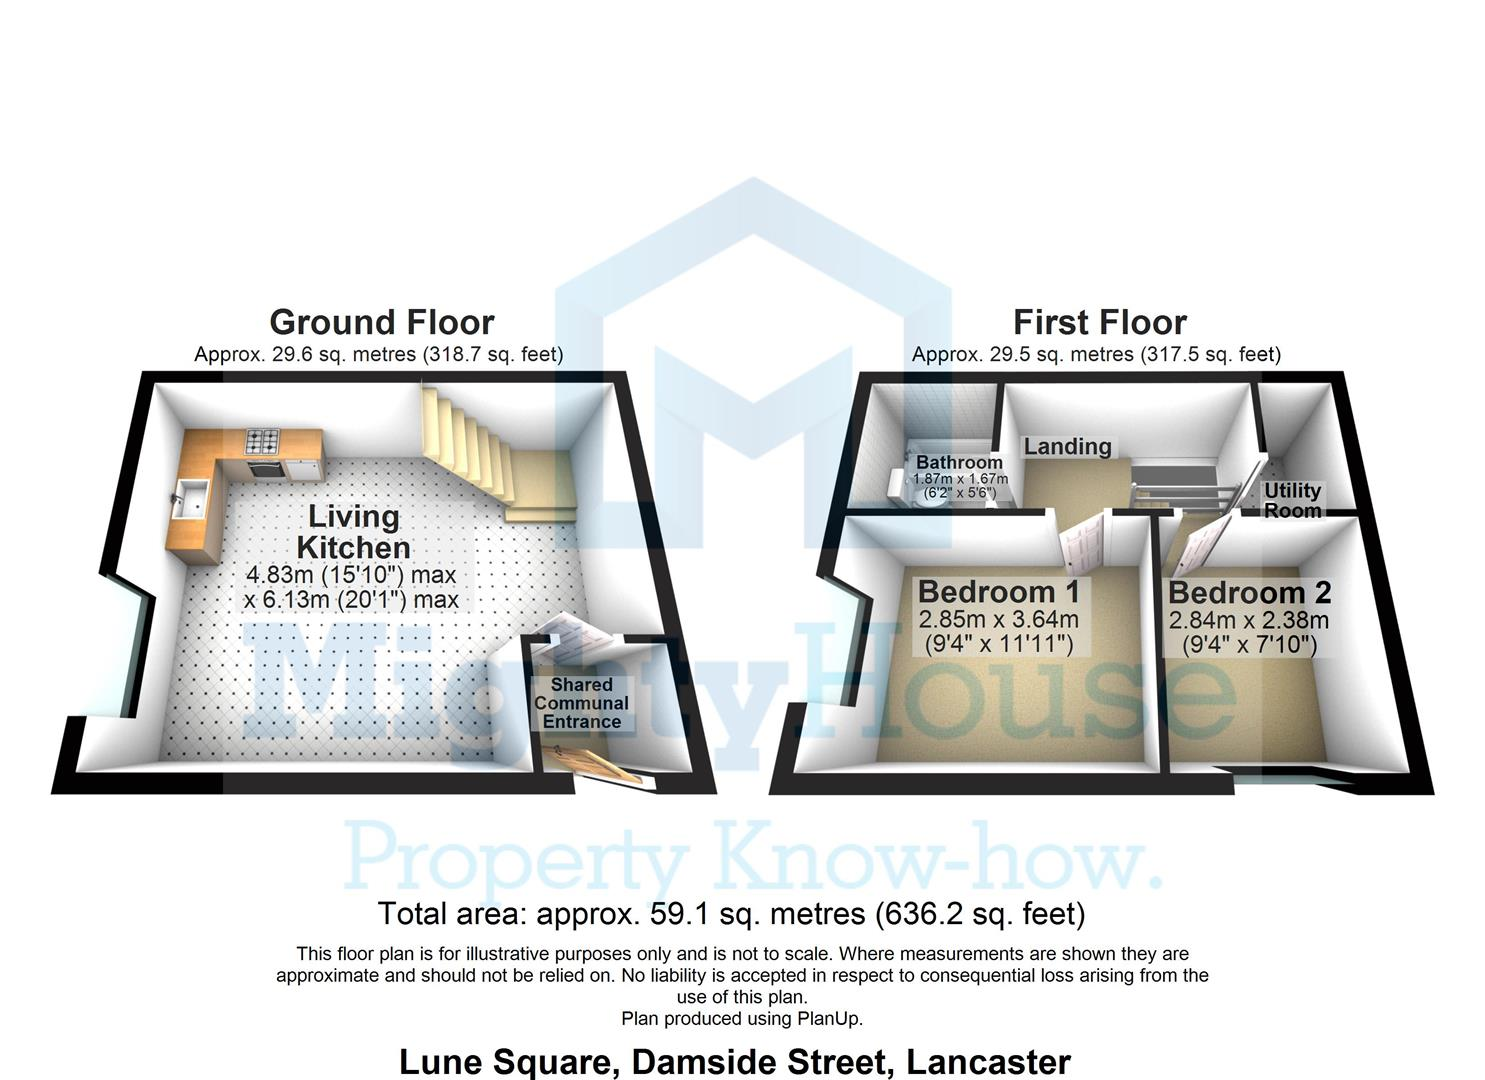 Lune Square, Damside Street, Lancaster - 3D.JPG